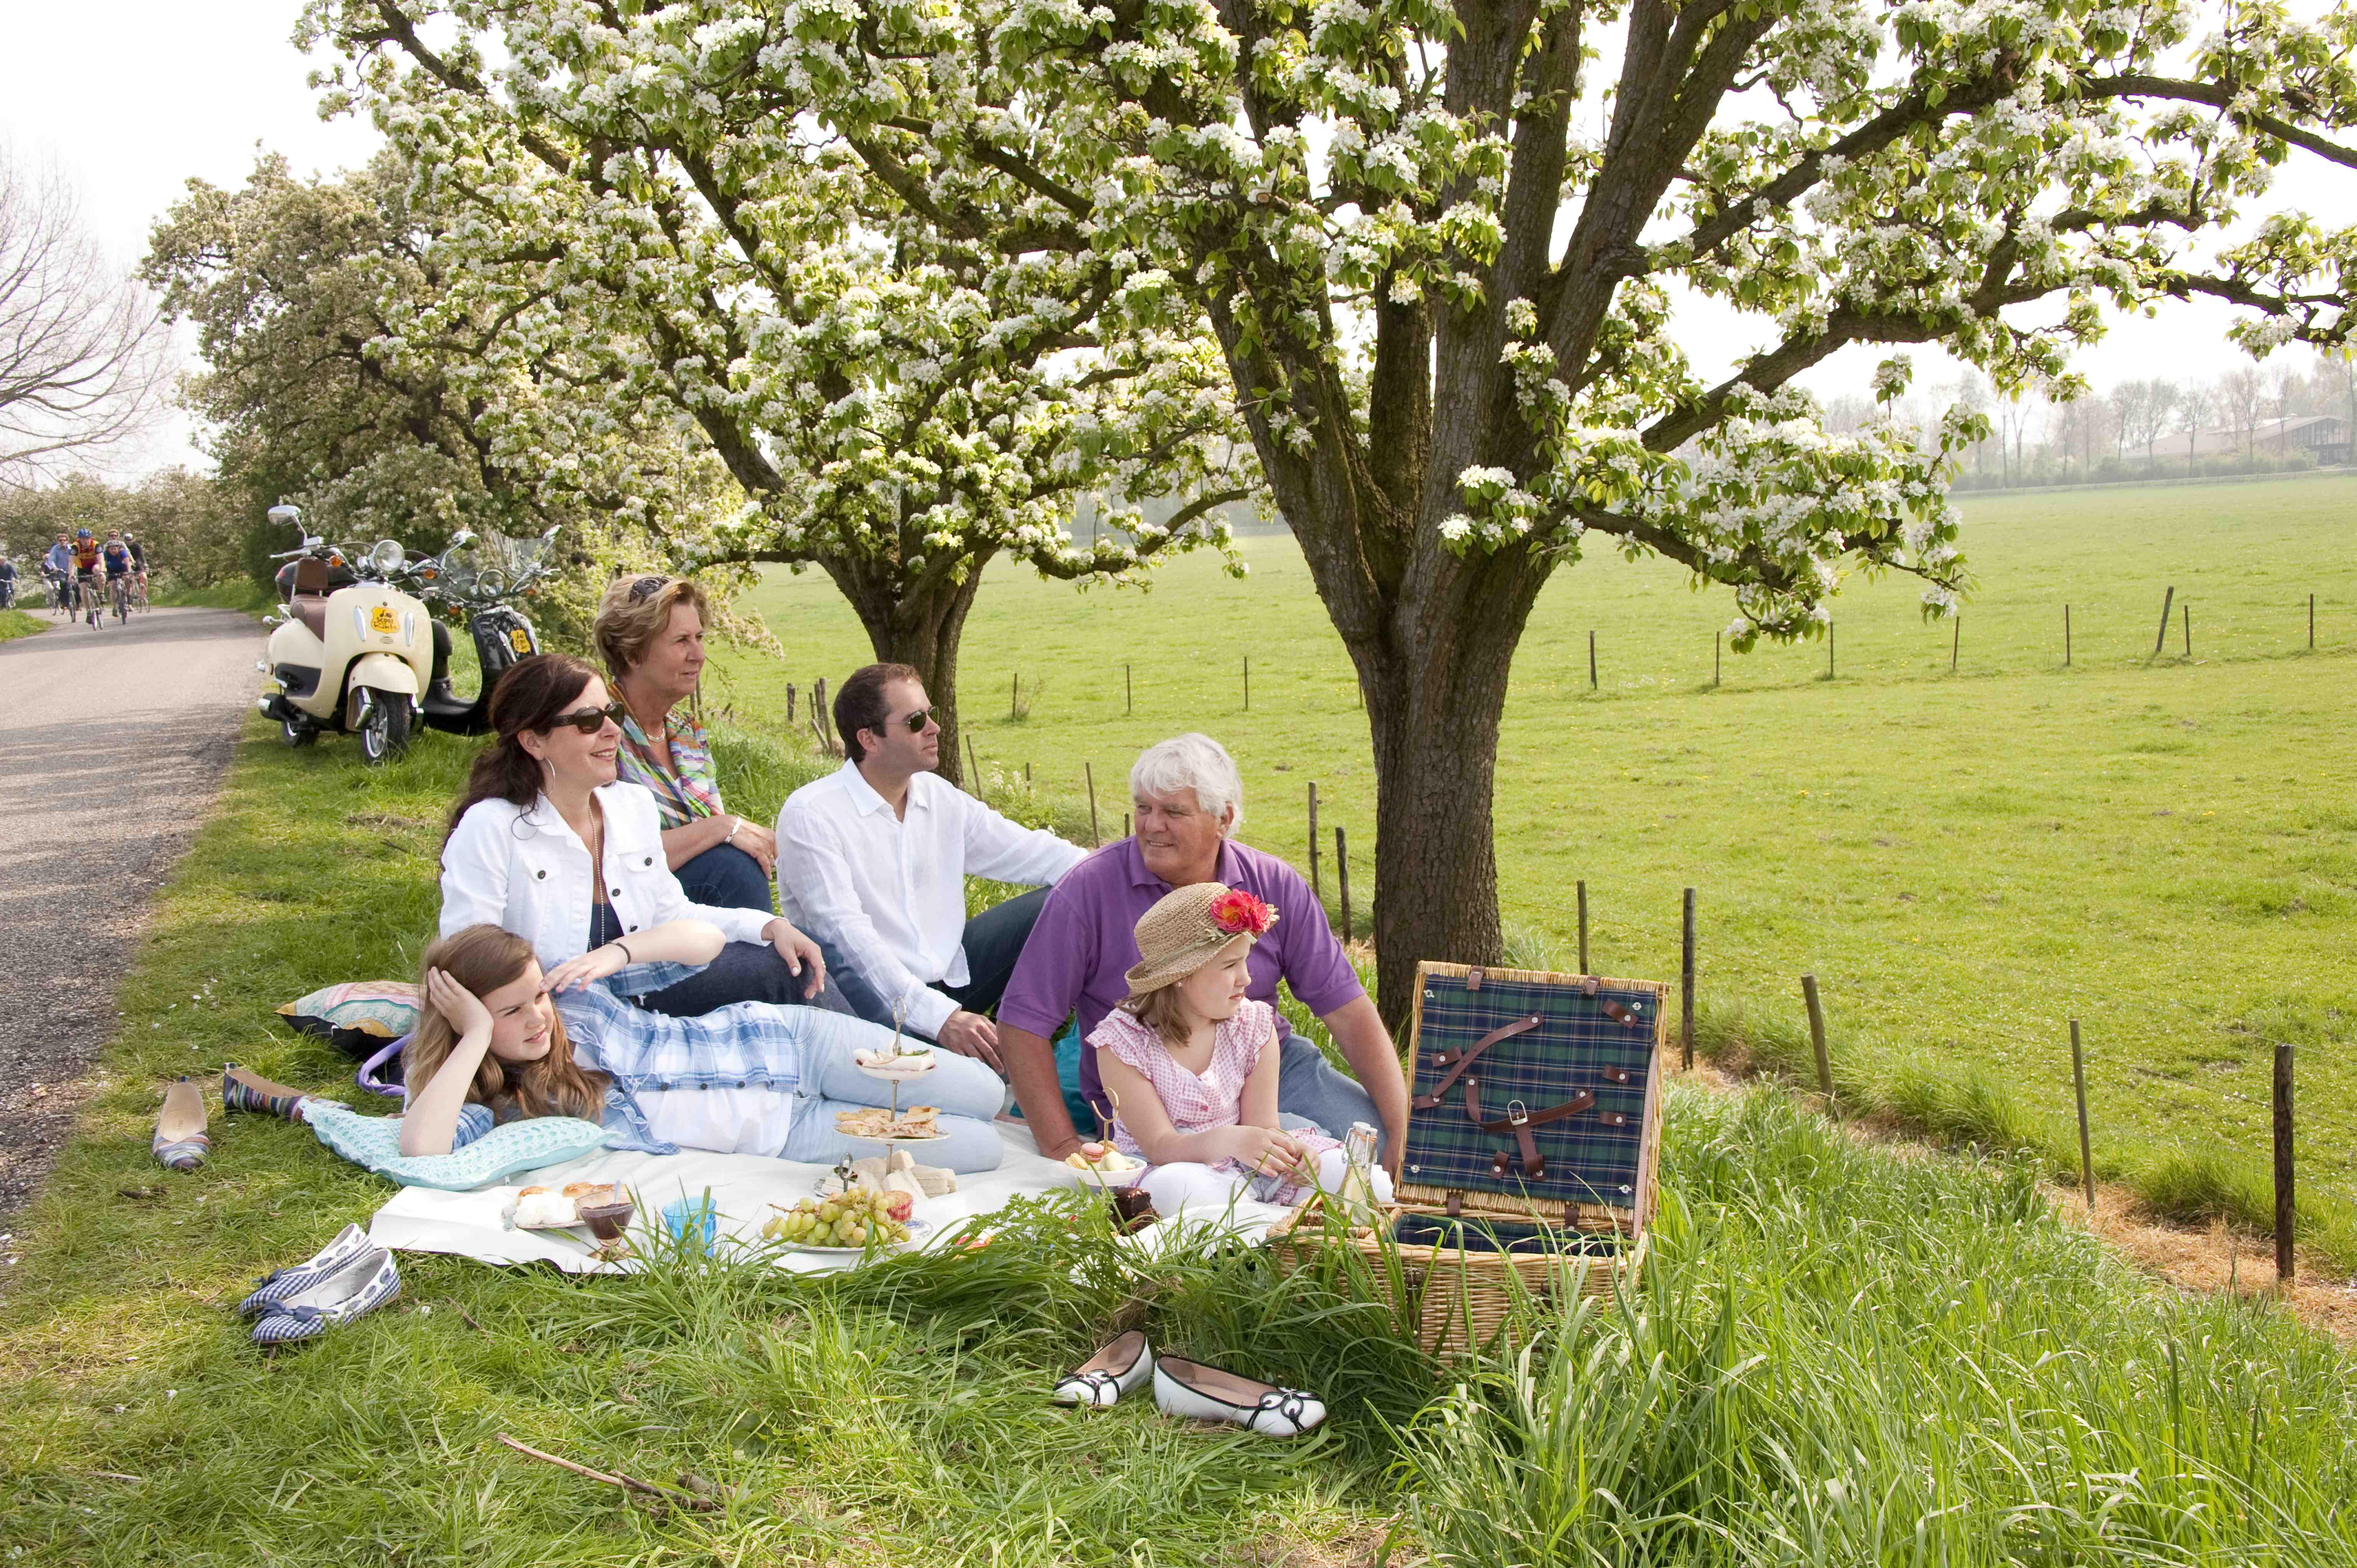 last minute angebote ostern picknick im rivierenland holland campings. Black Bedroom Furniture Sets. Home Design Ideas